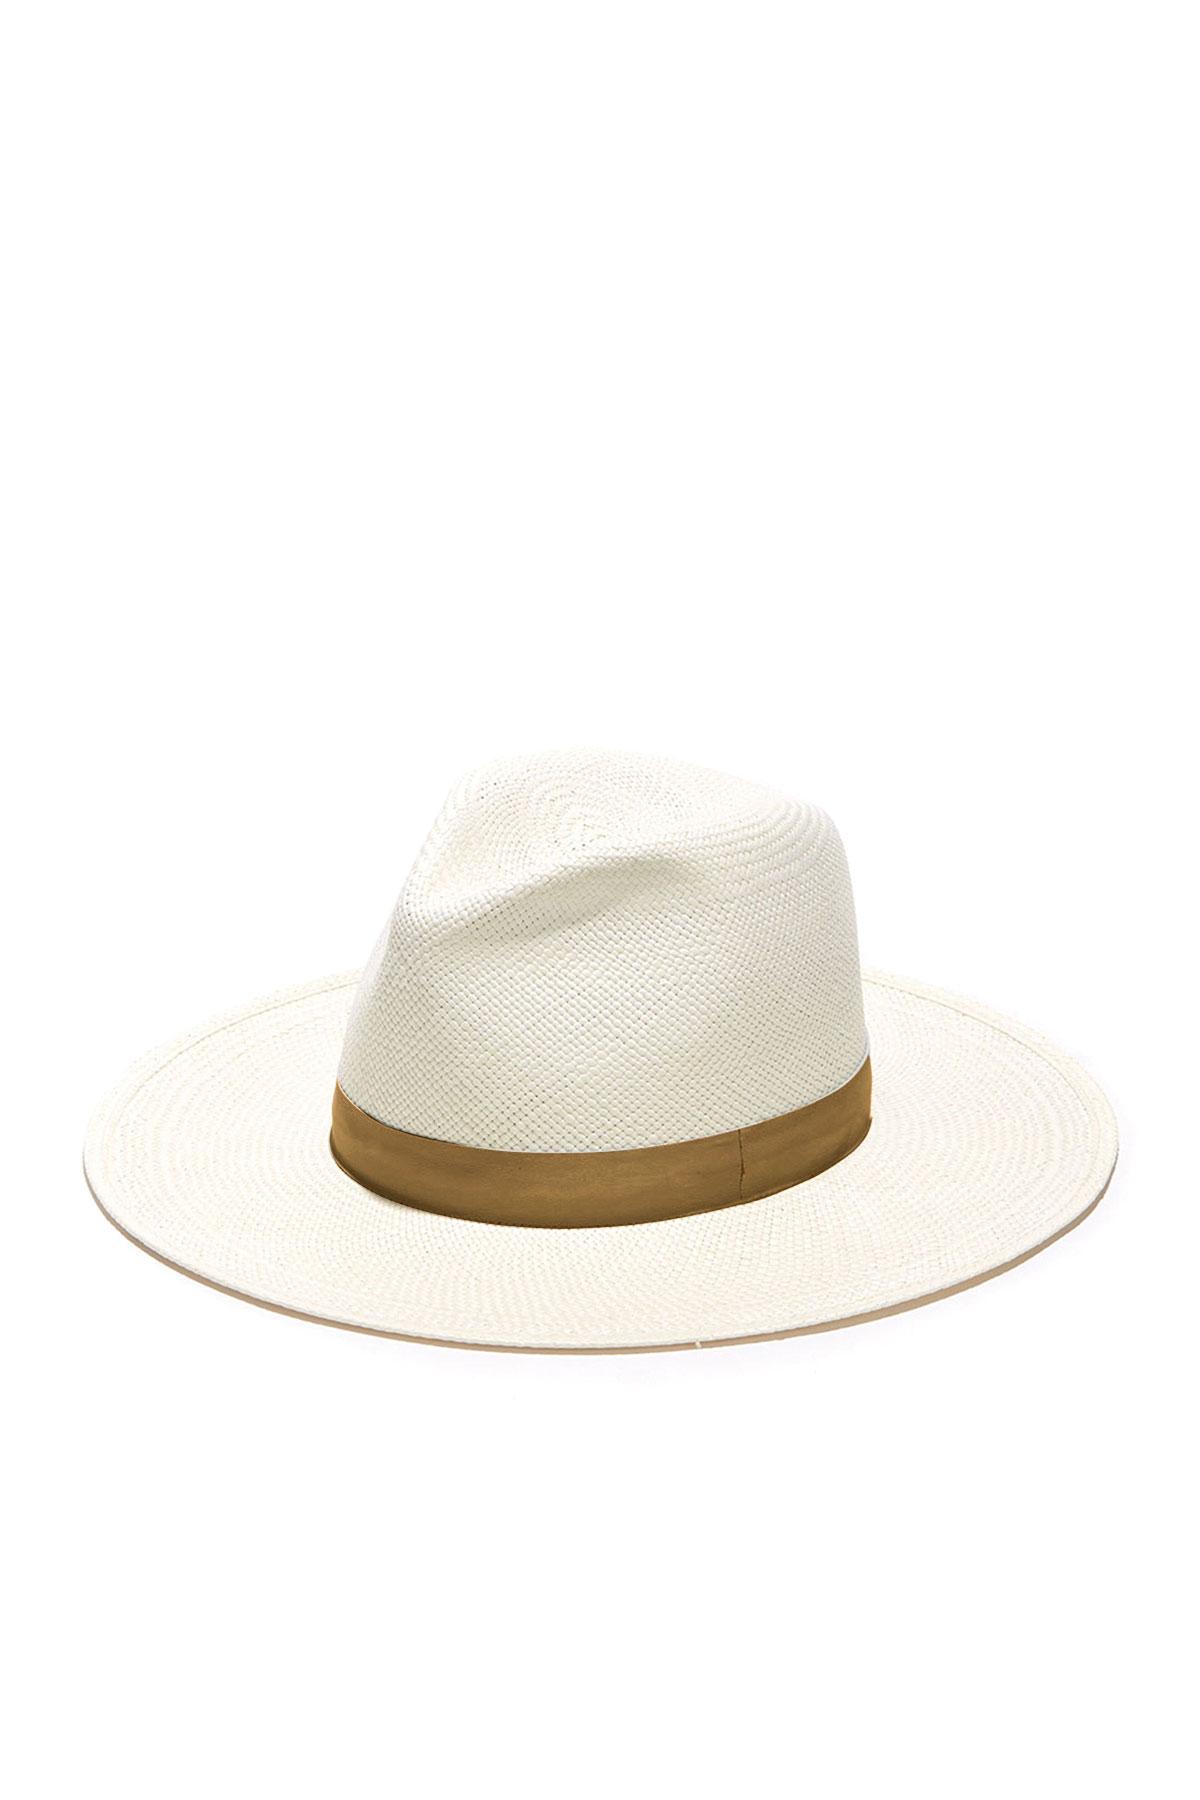 Janessa Leone AISLEY STRAW FEDORA HAT